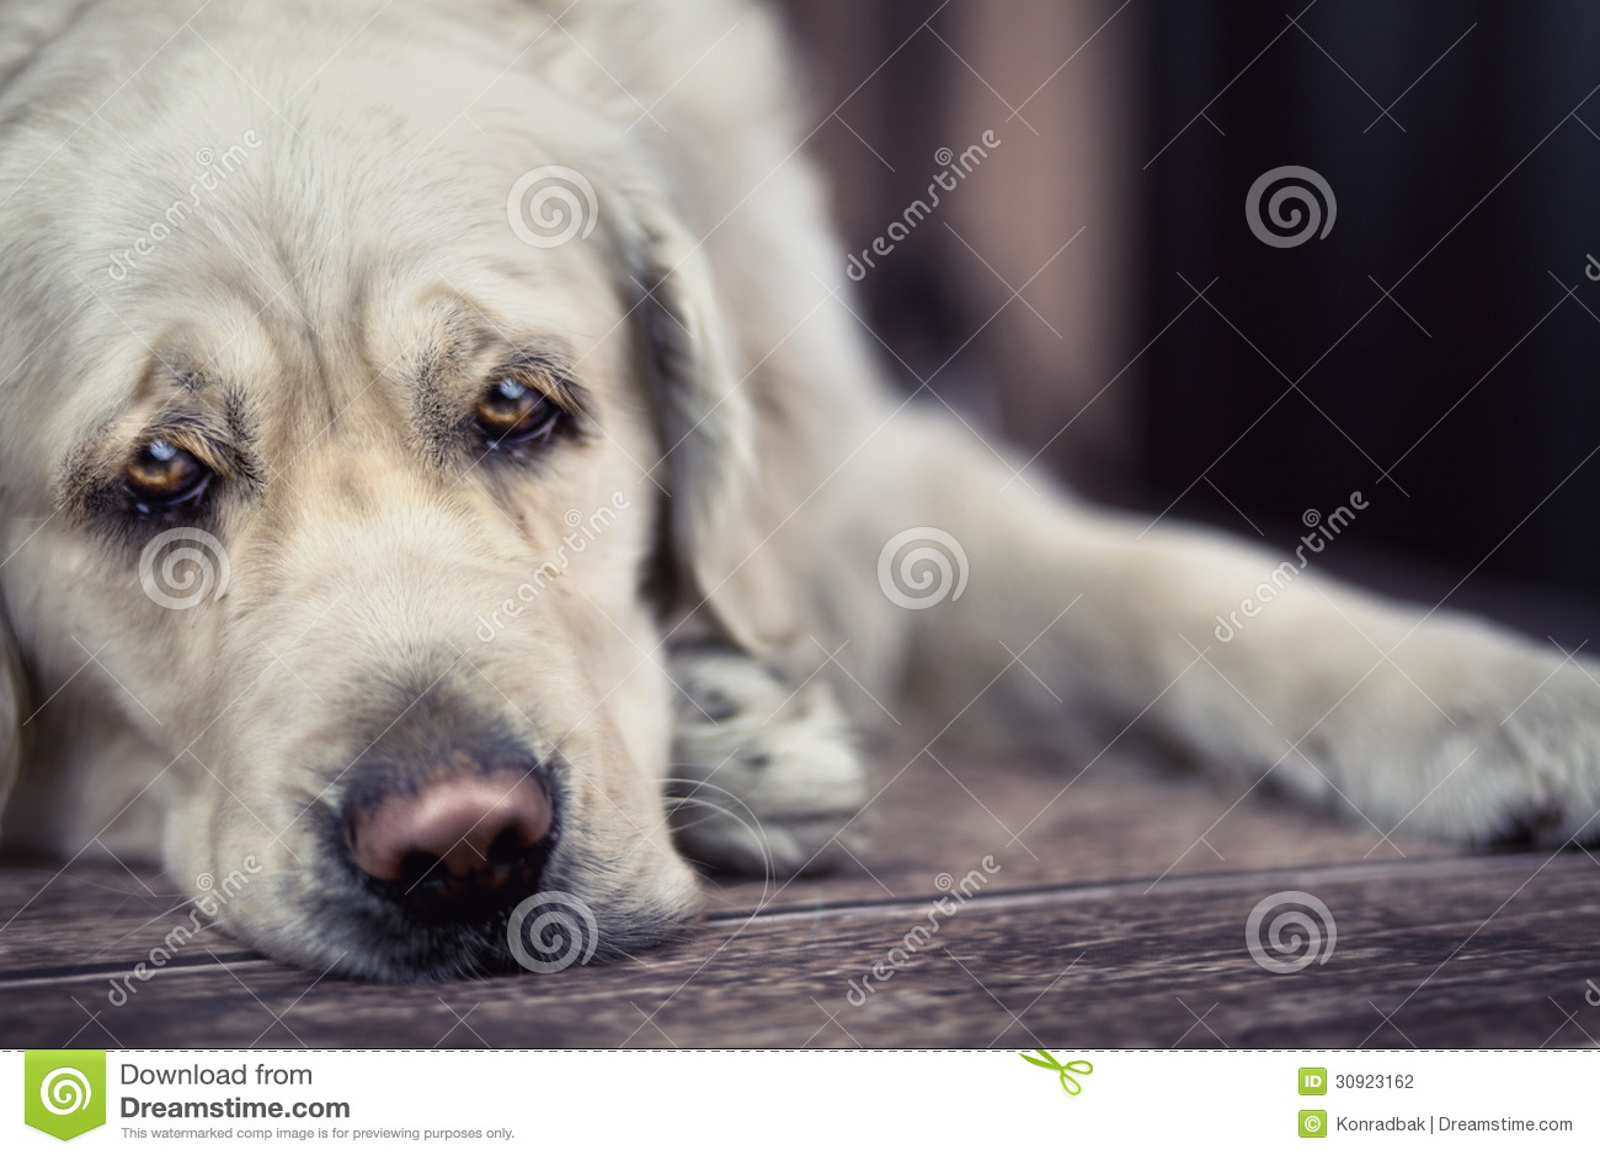 Cartoon dog stock photos images amp pictures shutterstock - Sad Eyes Of Big White Dog Stock Photography Image 30923162